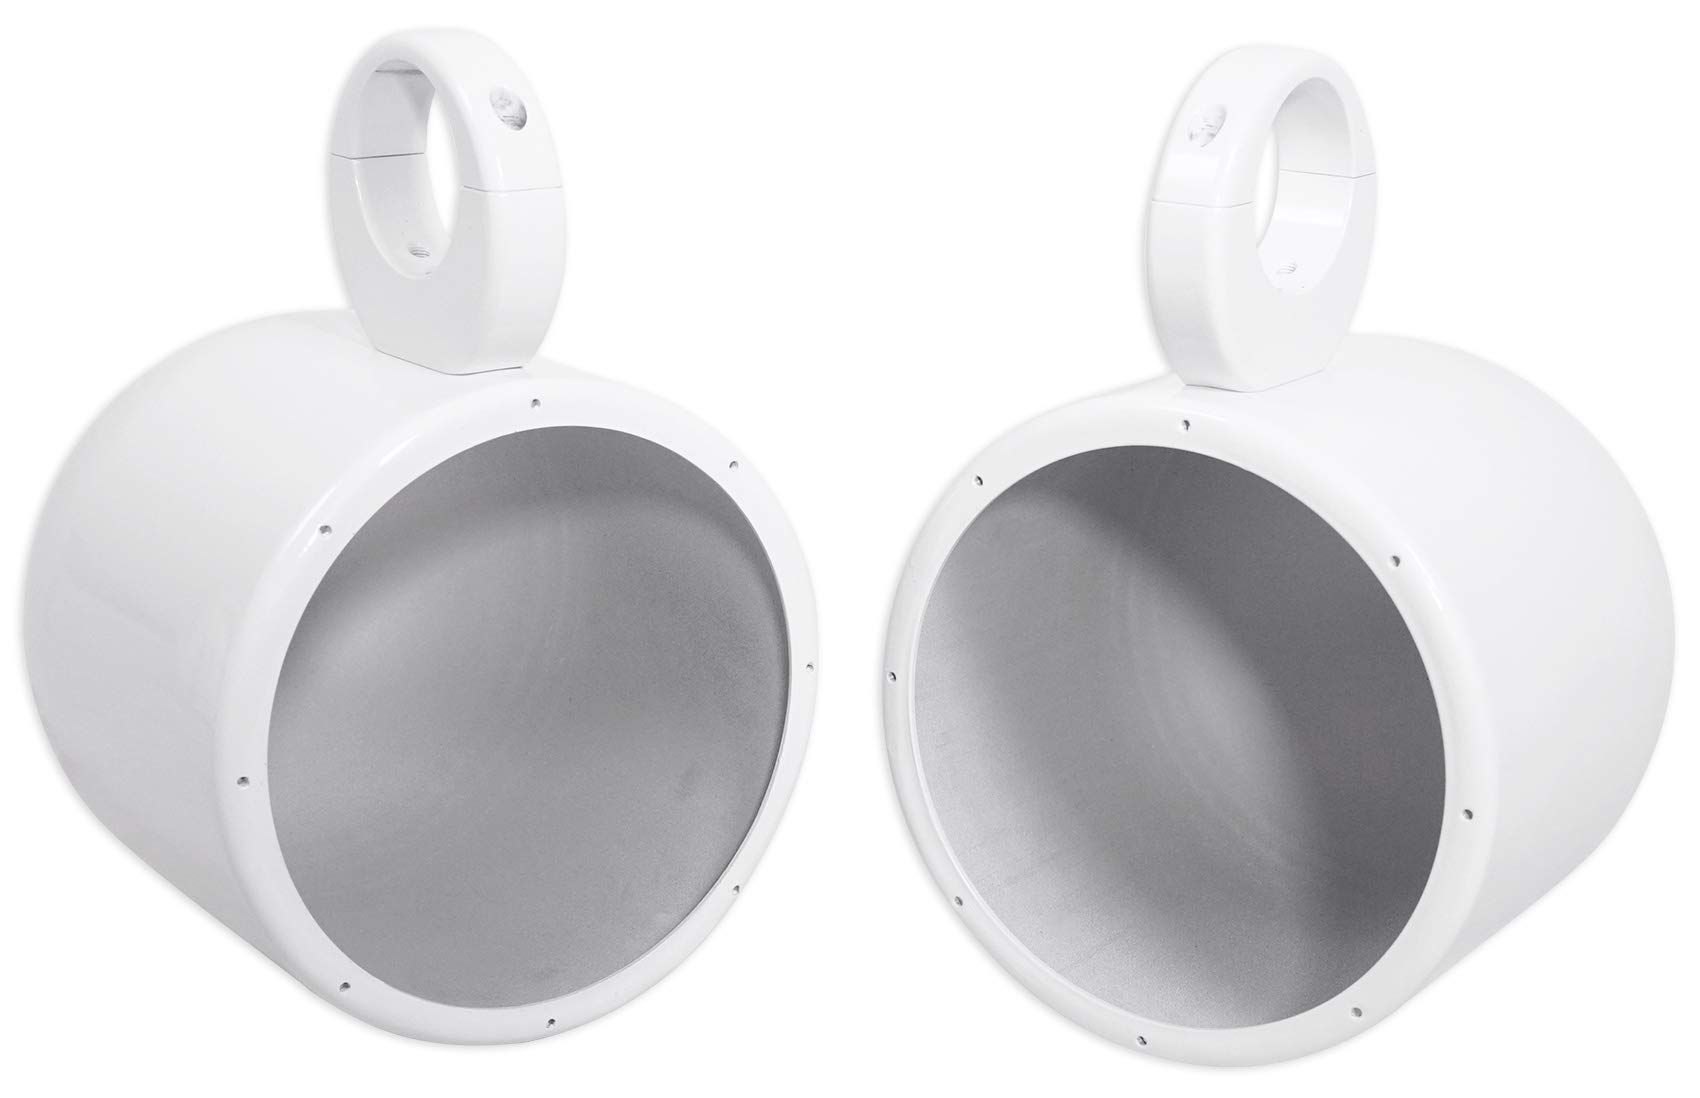 Pair Metal Wakeboard Speaker Pods 4 Kicker, Pyle, Fusion, MTX - White